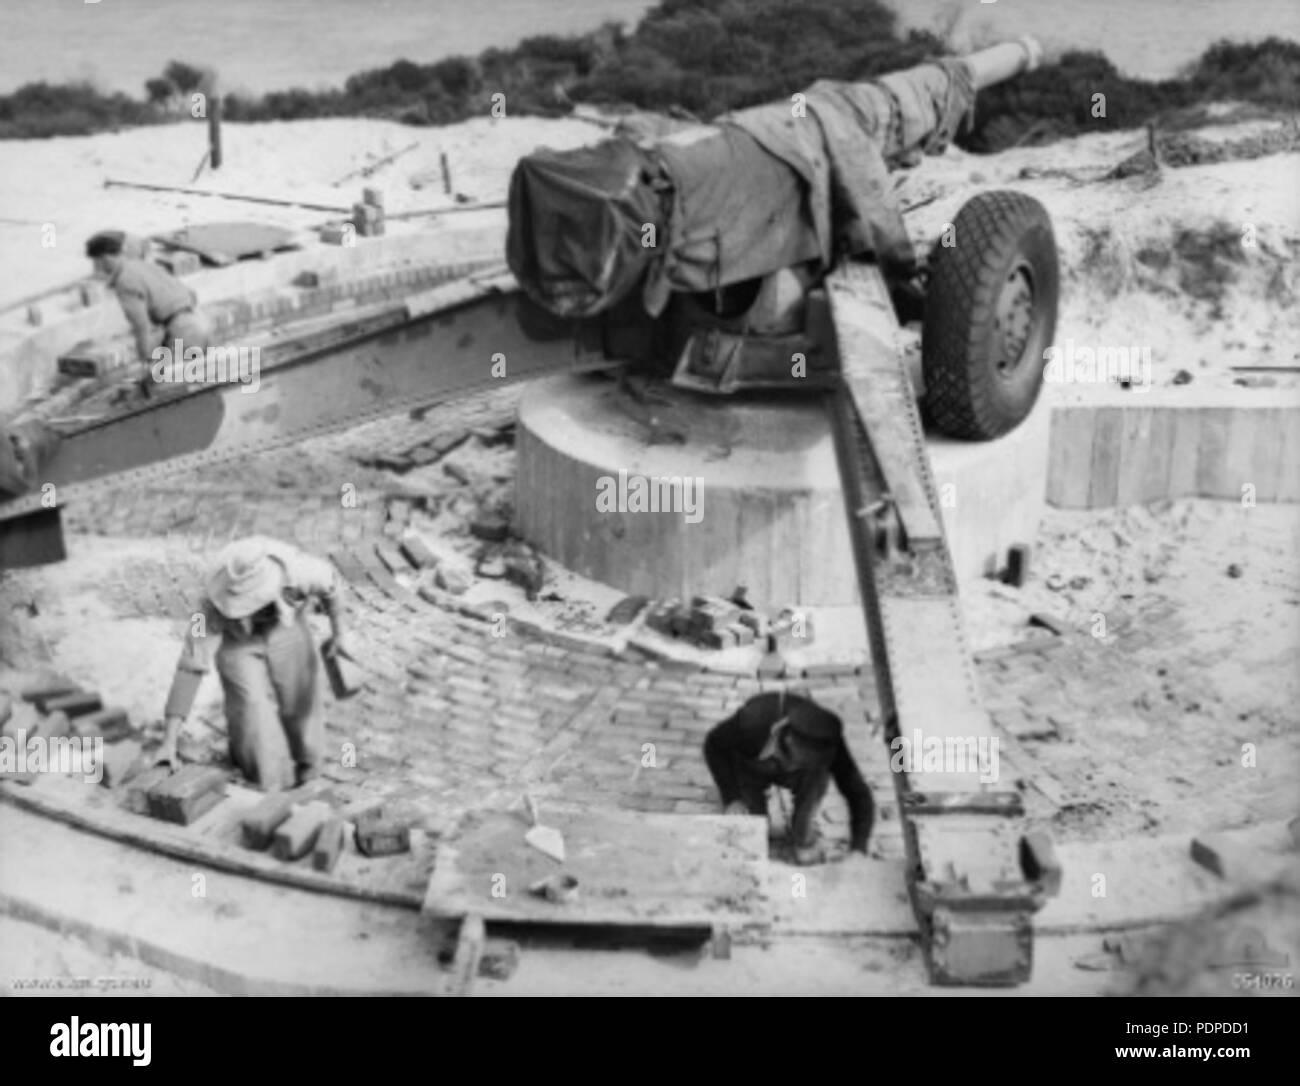 3 155mm Gpf Garden Island Wa 1943 Awm 054026 Stock Photo 215008445